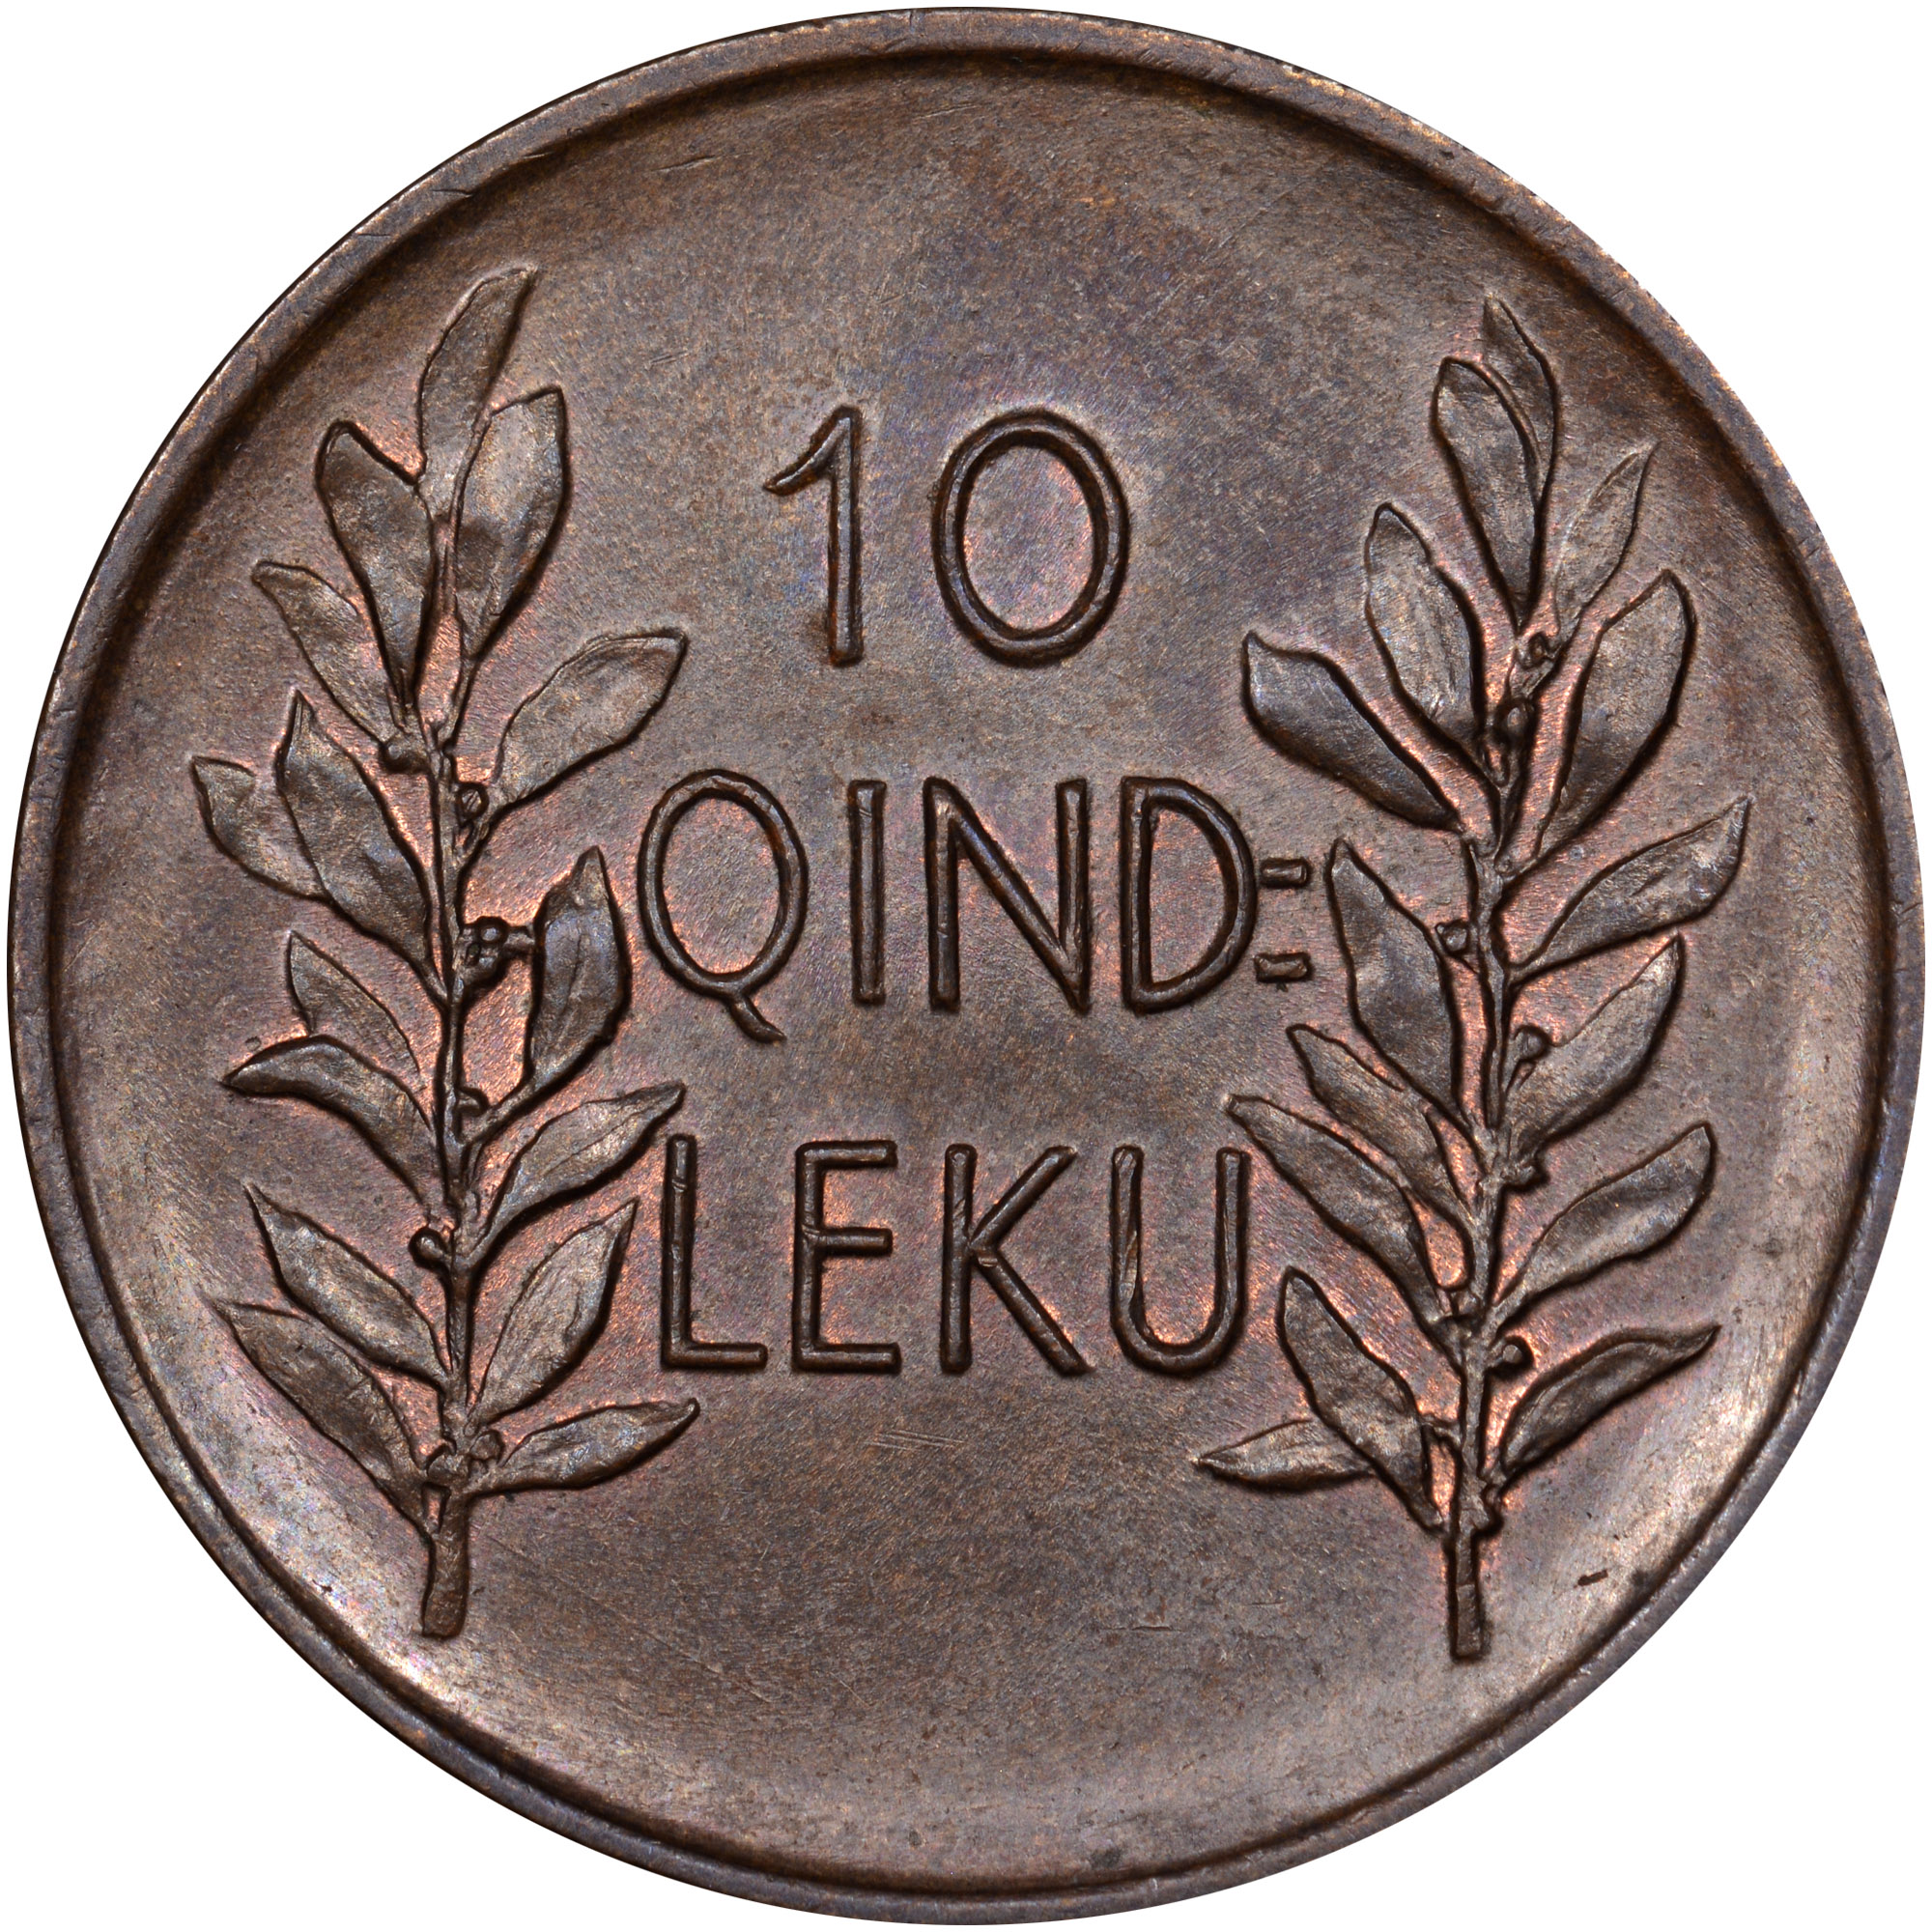 1926 Albania 10 Qindar Leku reverse